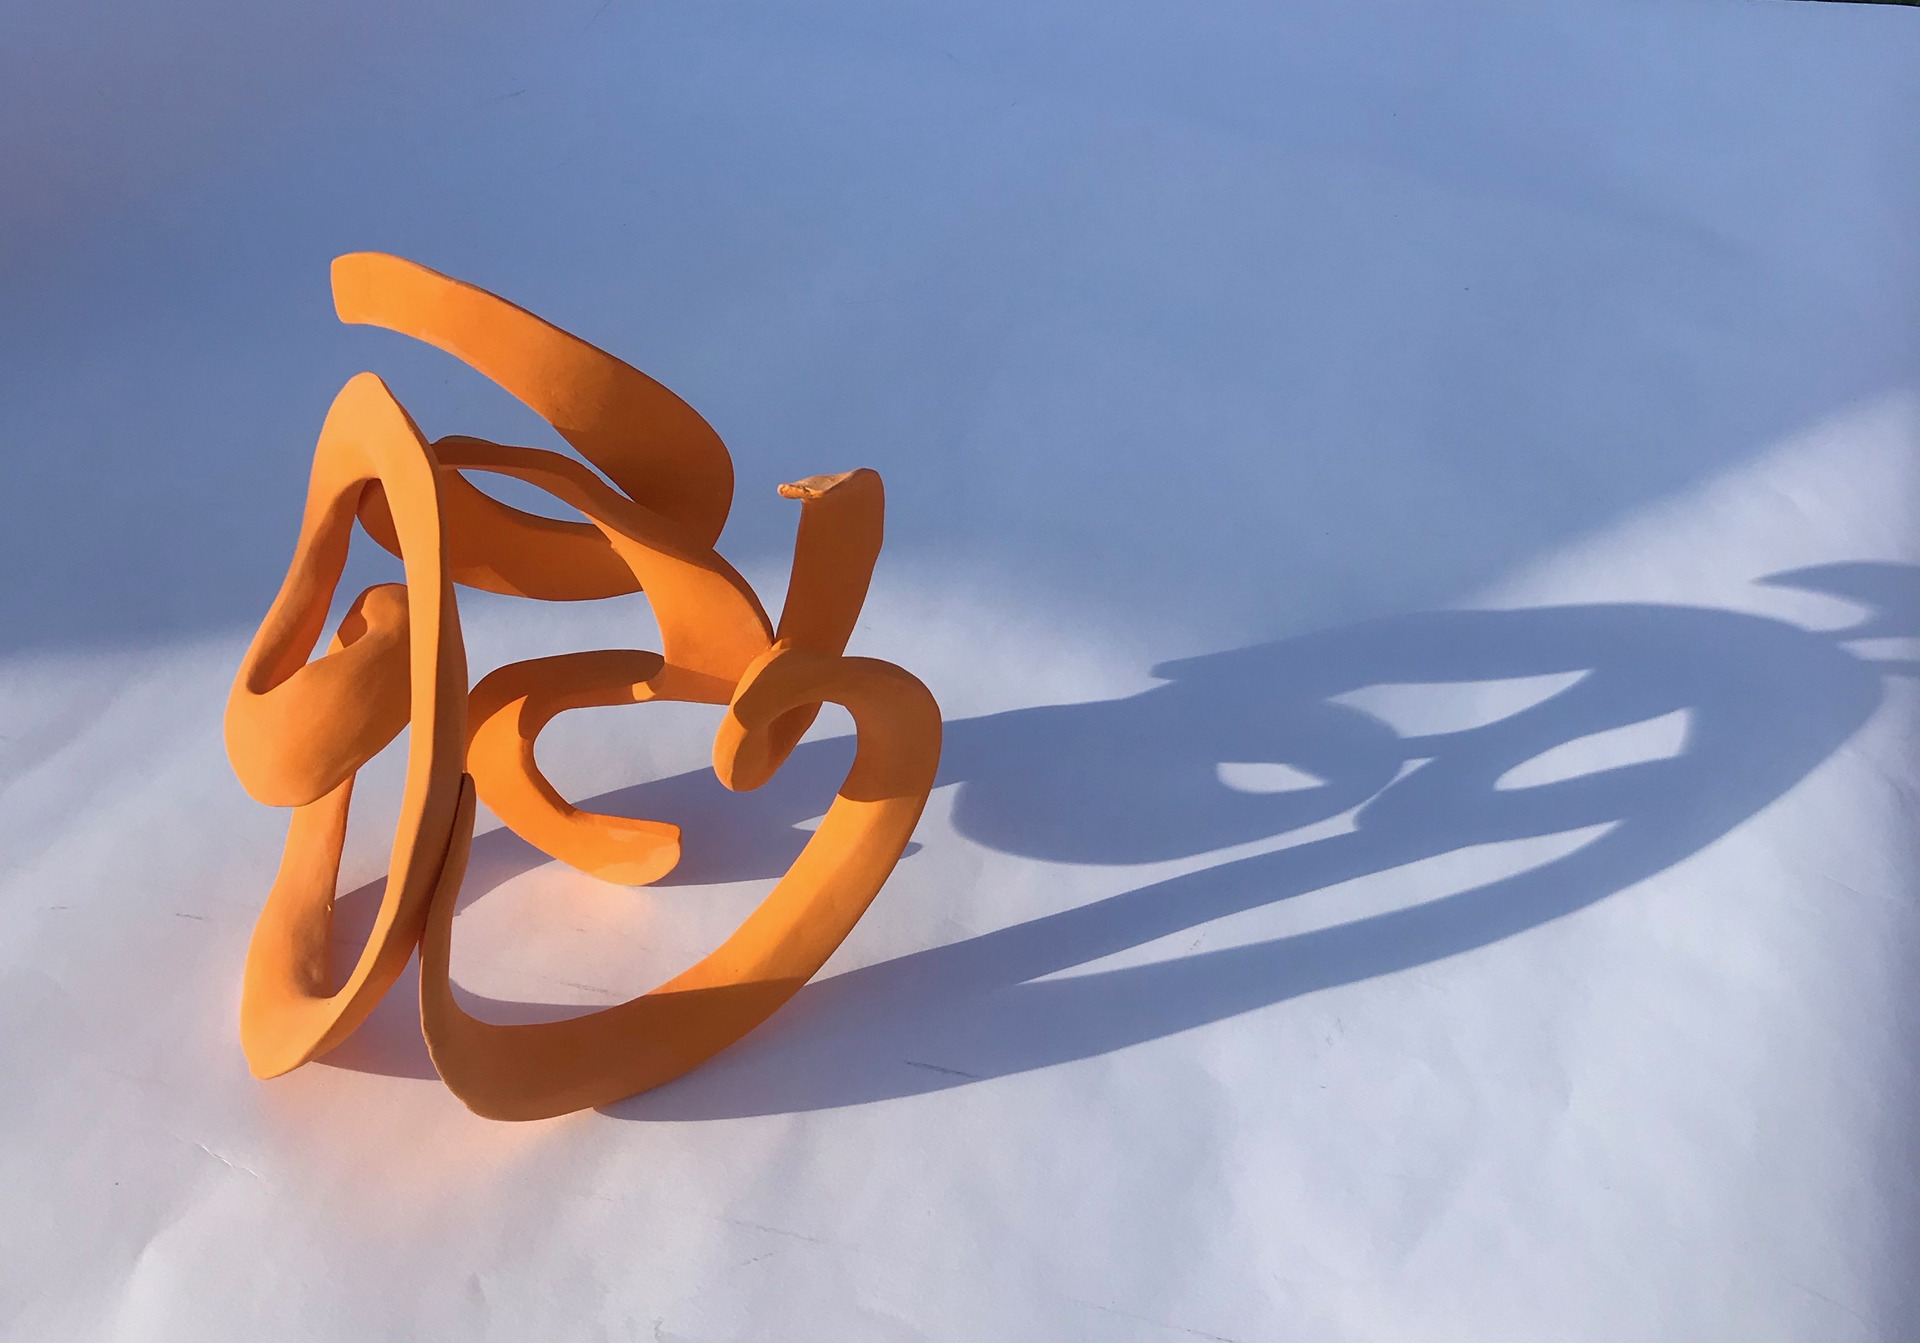 'Orange Twist' 24cm3 porcelain